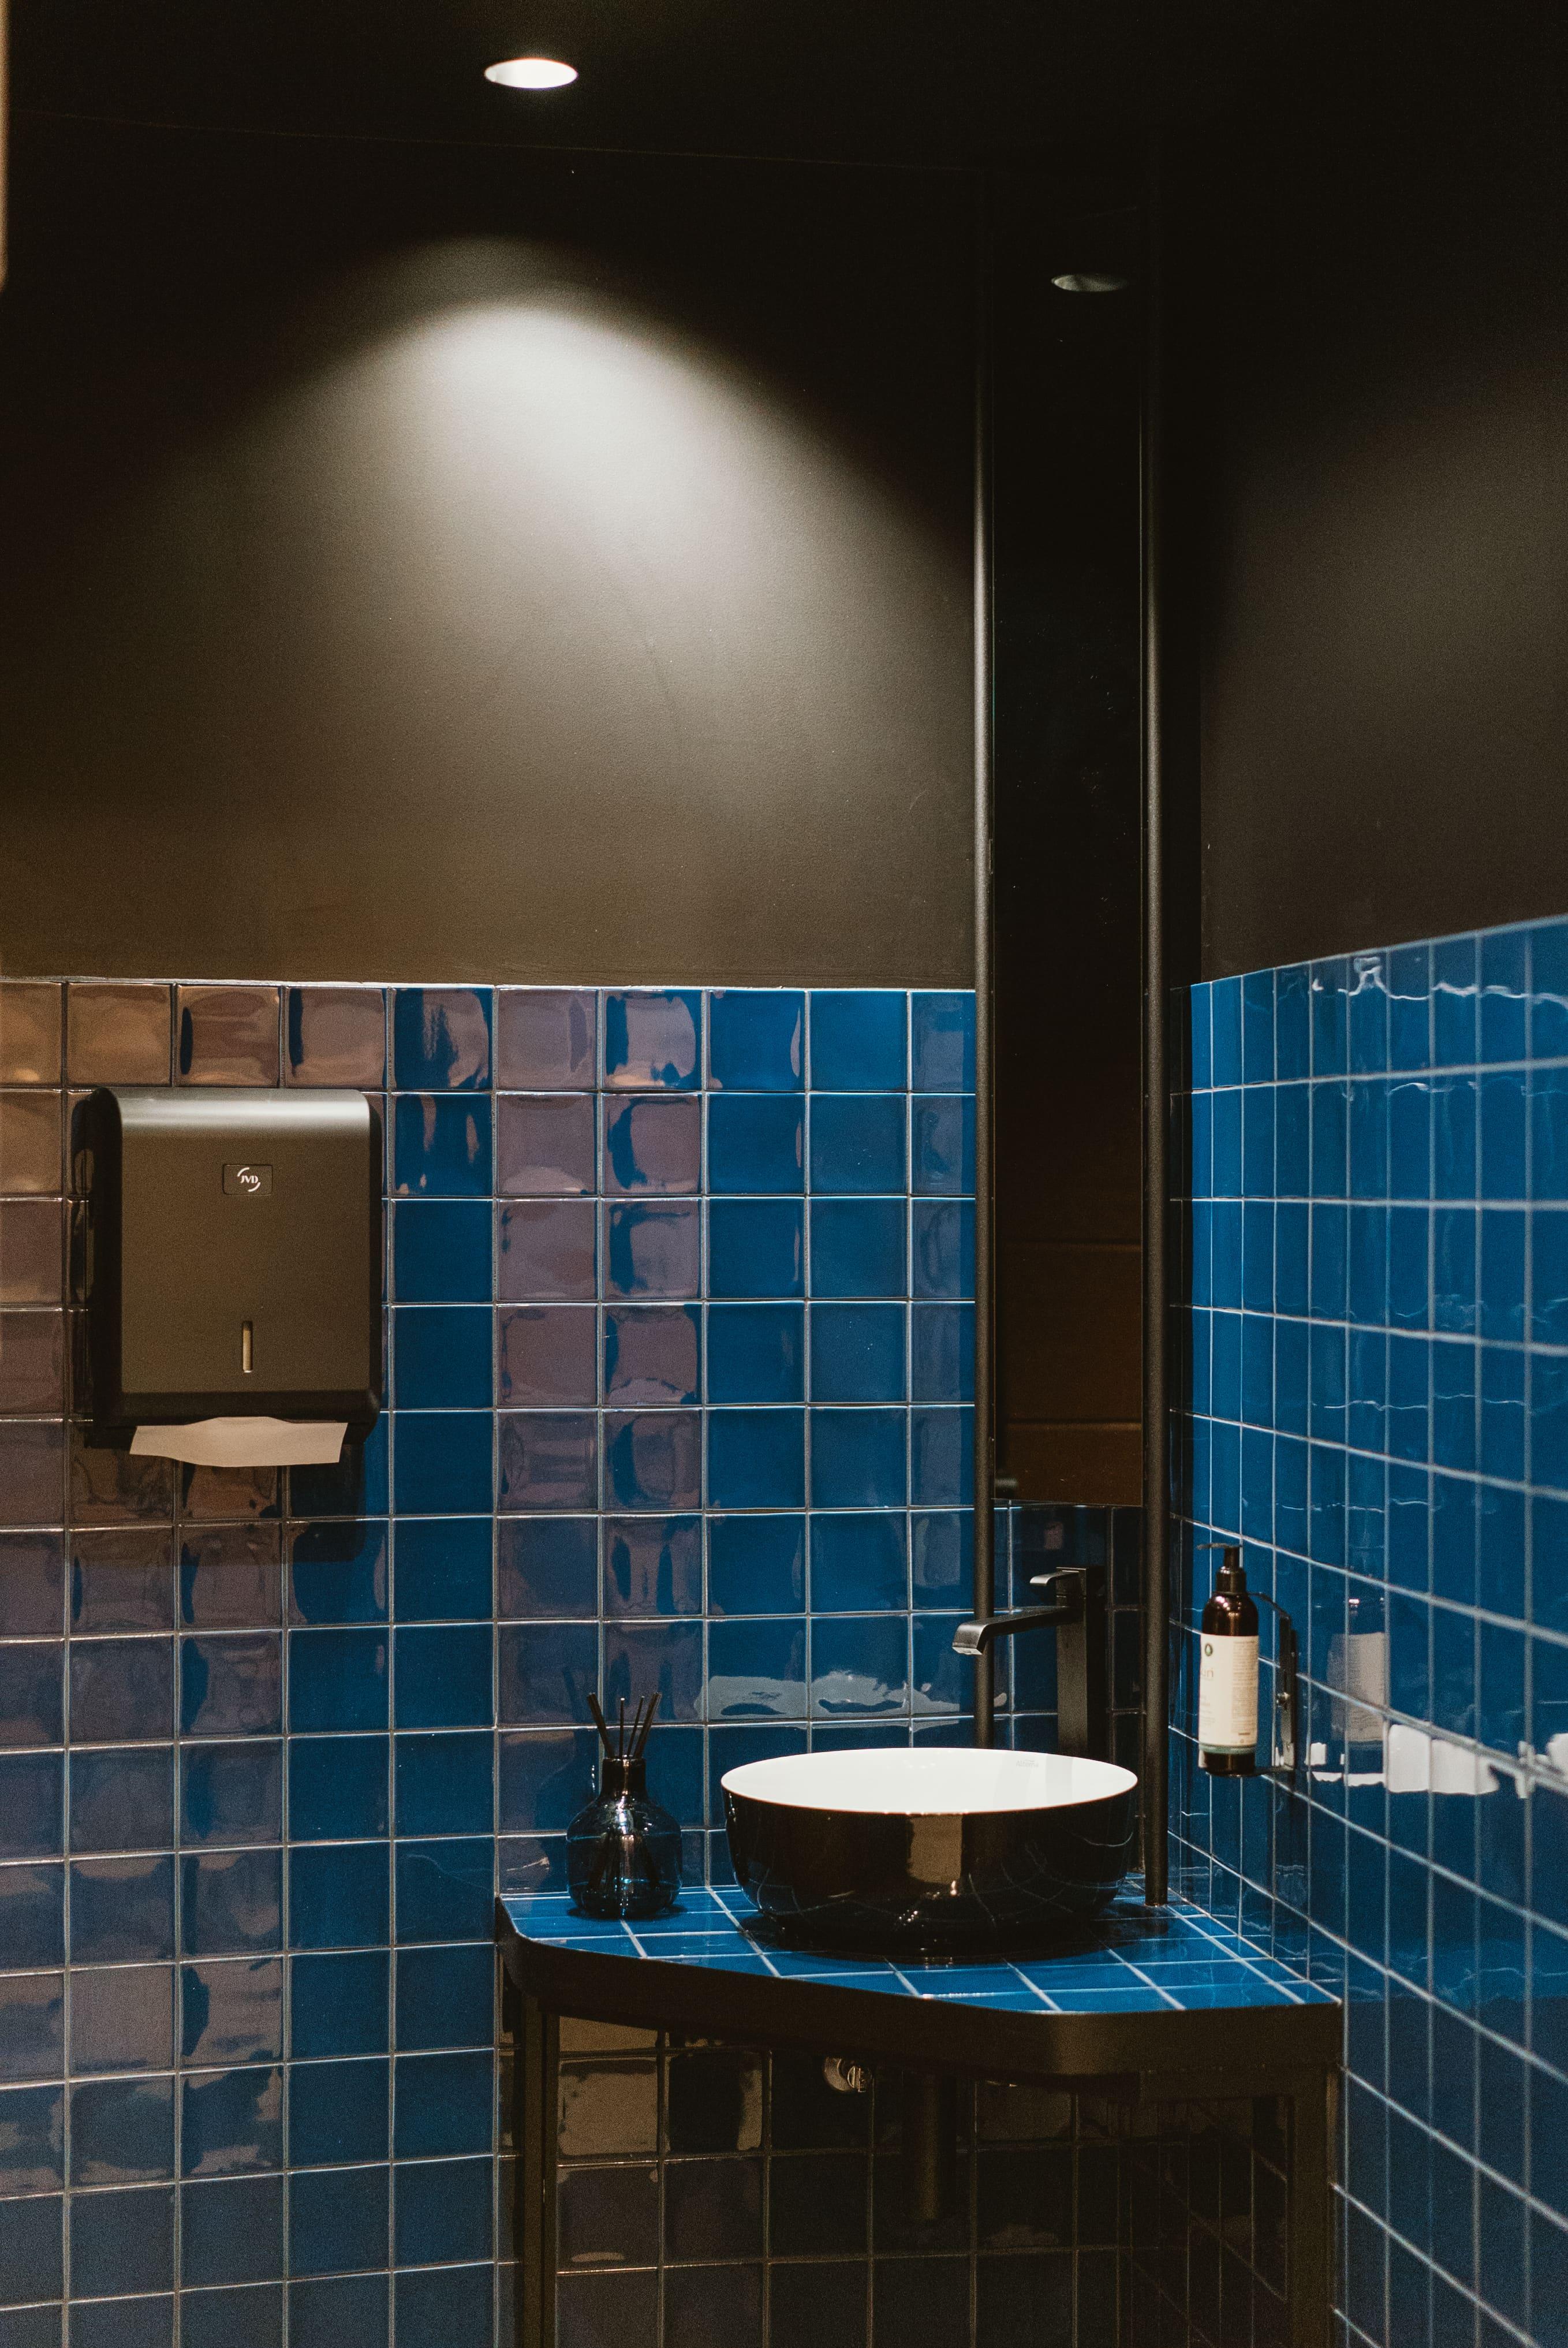 Agencement interieur design métallique ROBI restaurant Haven Annecy 74 agencement en metal 12